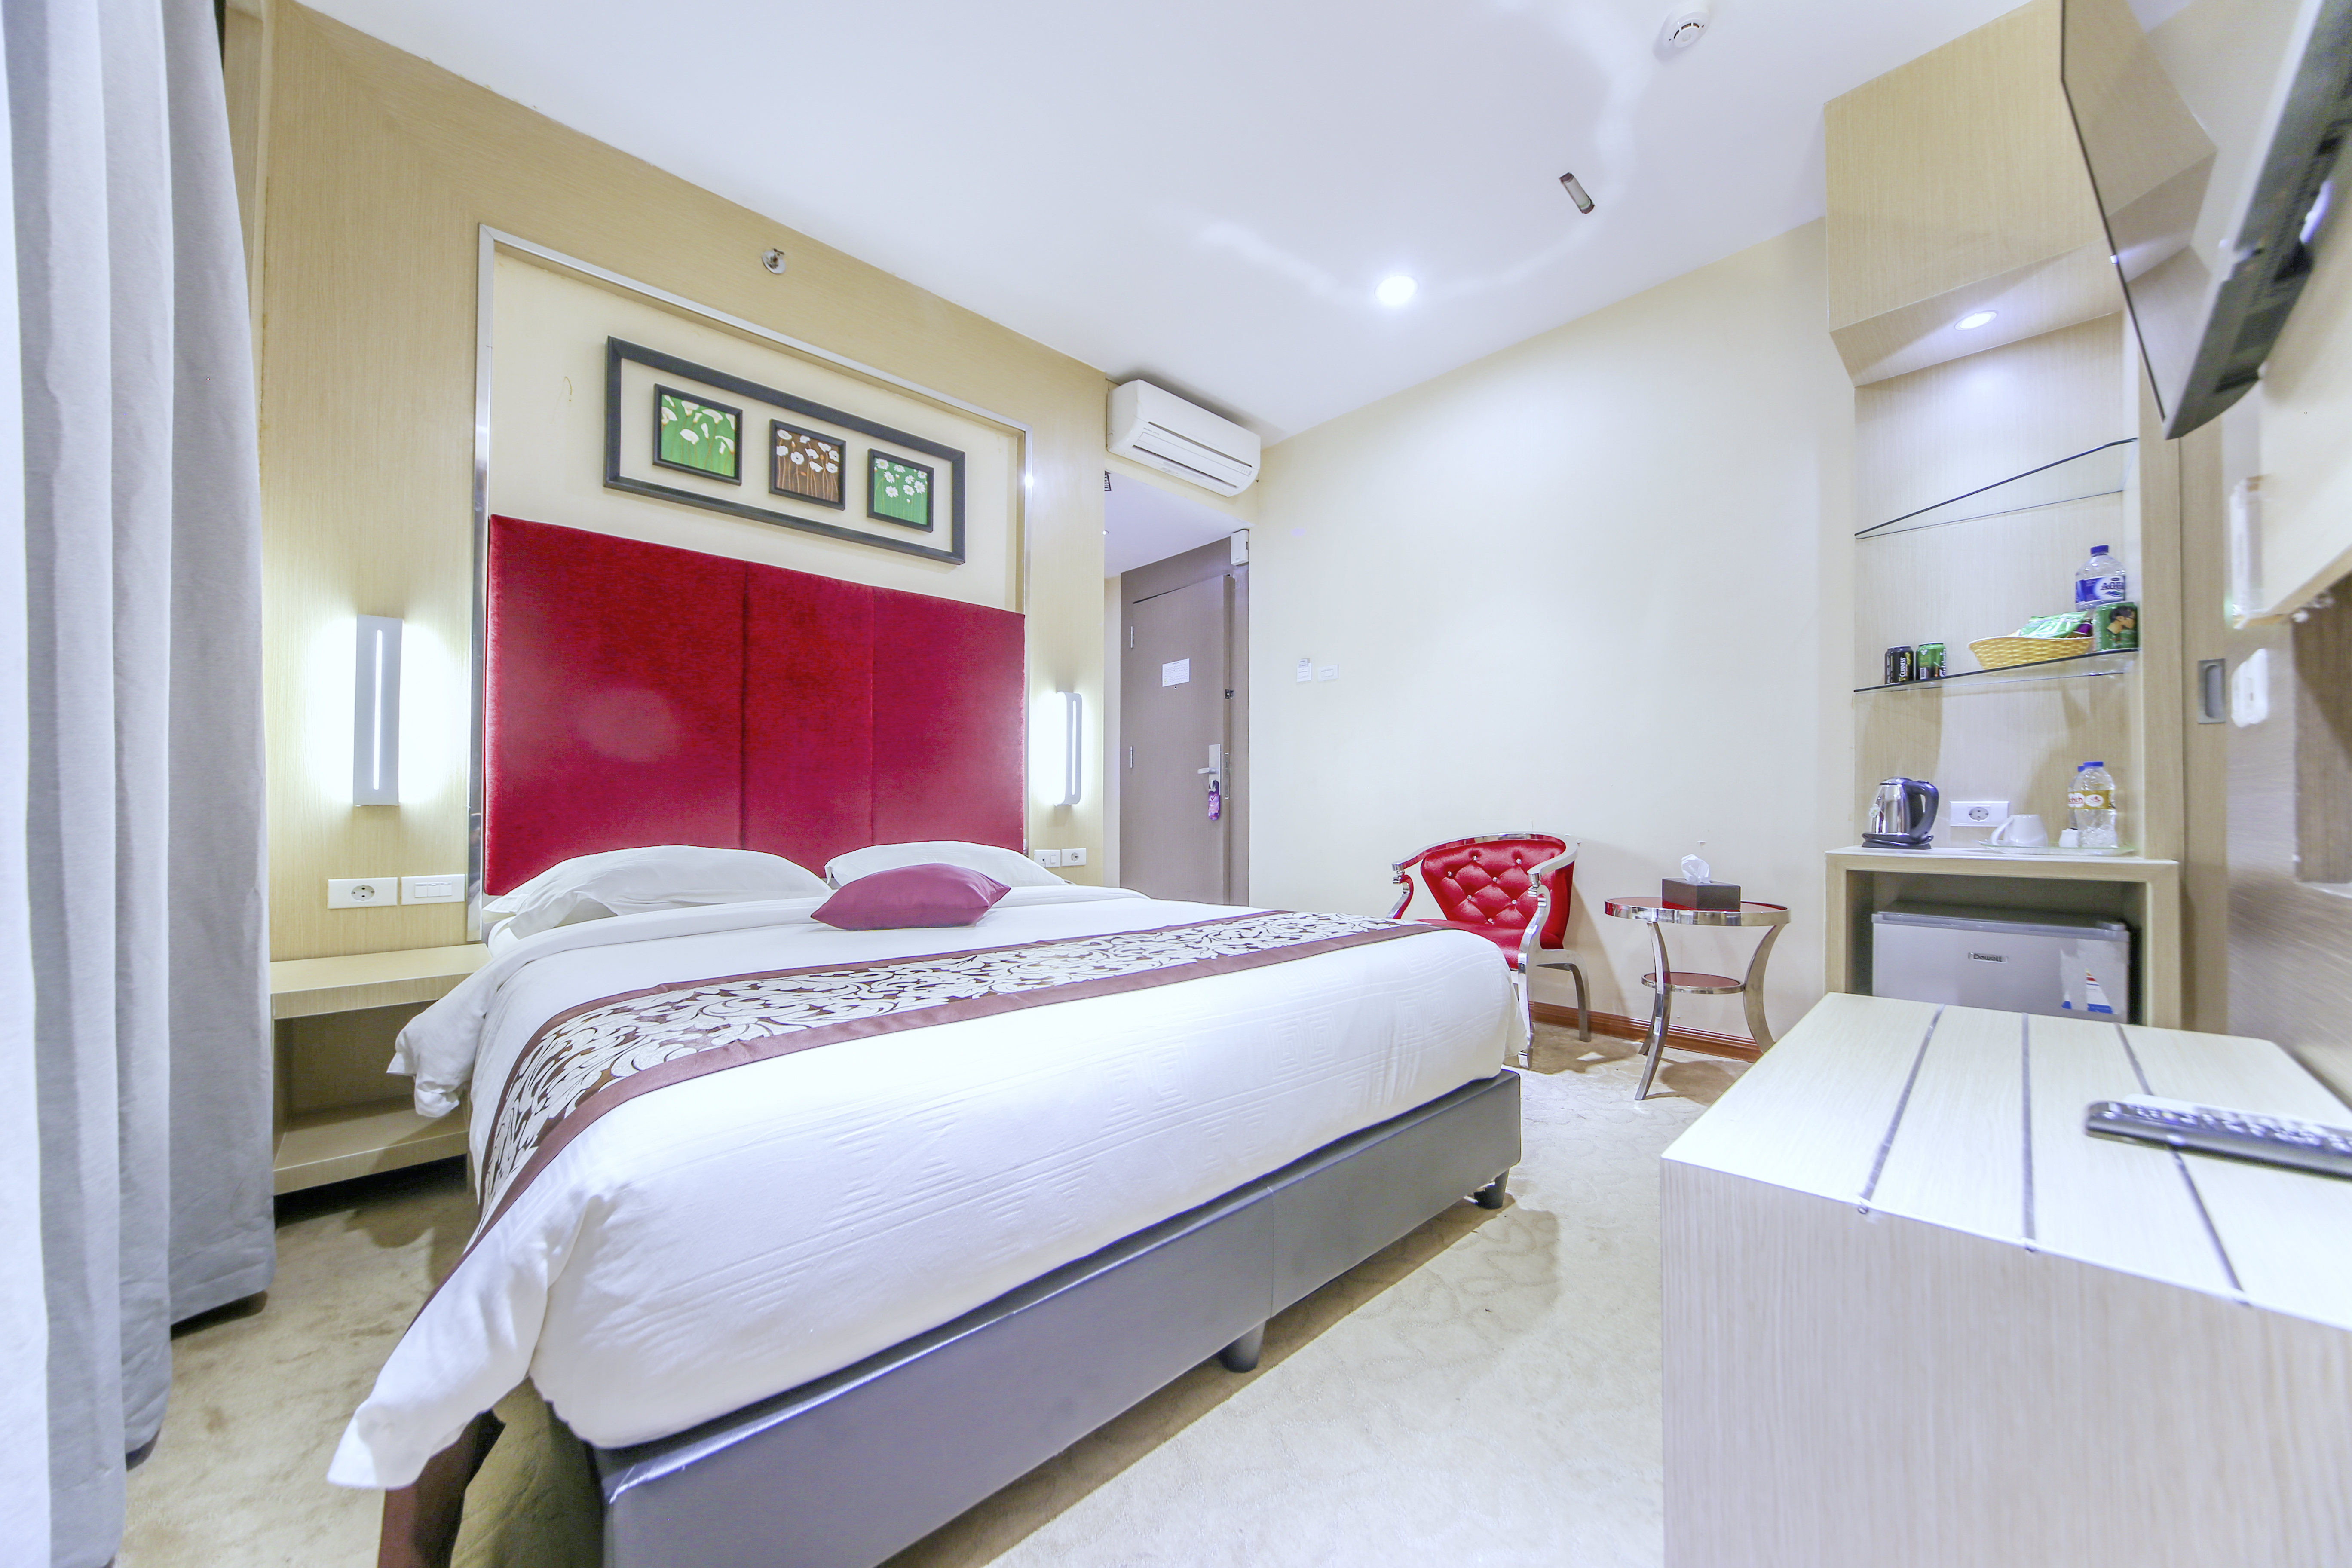 Batam City Hotel Deluxe Room # Meuble Tv Kaorka